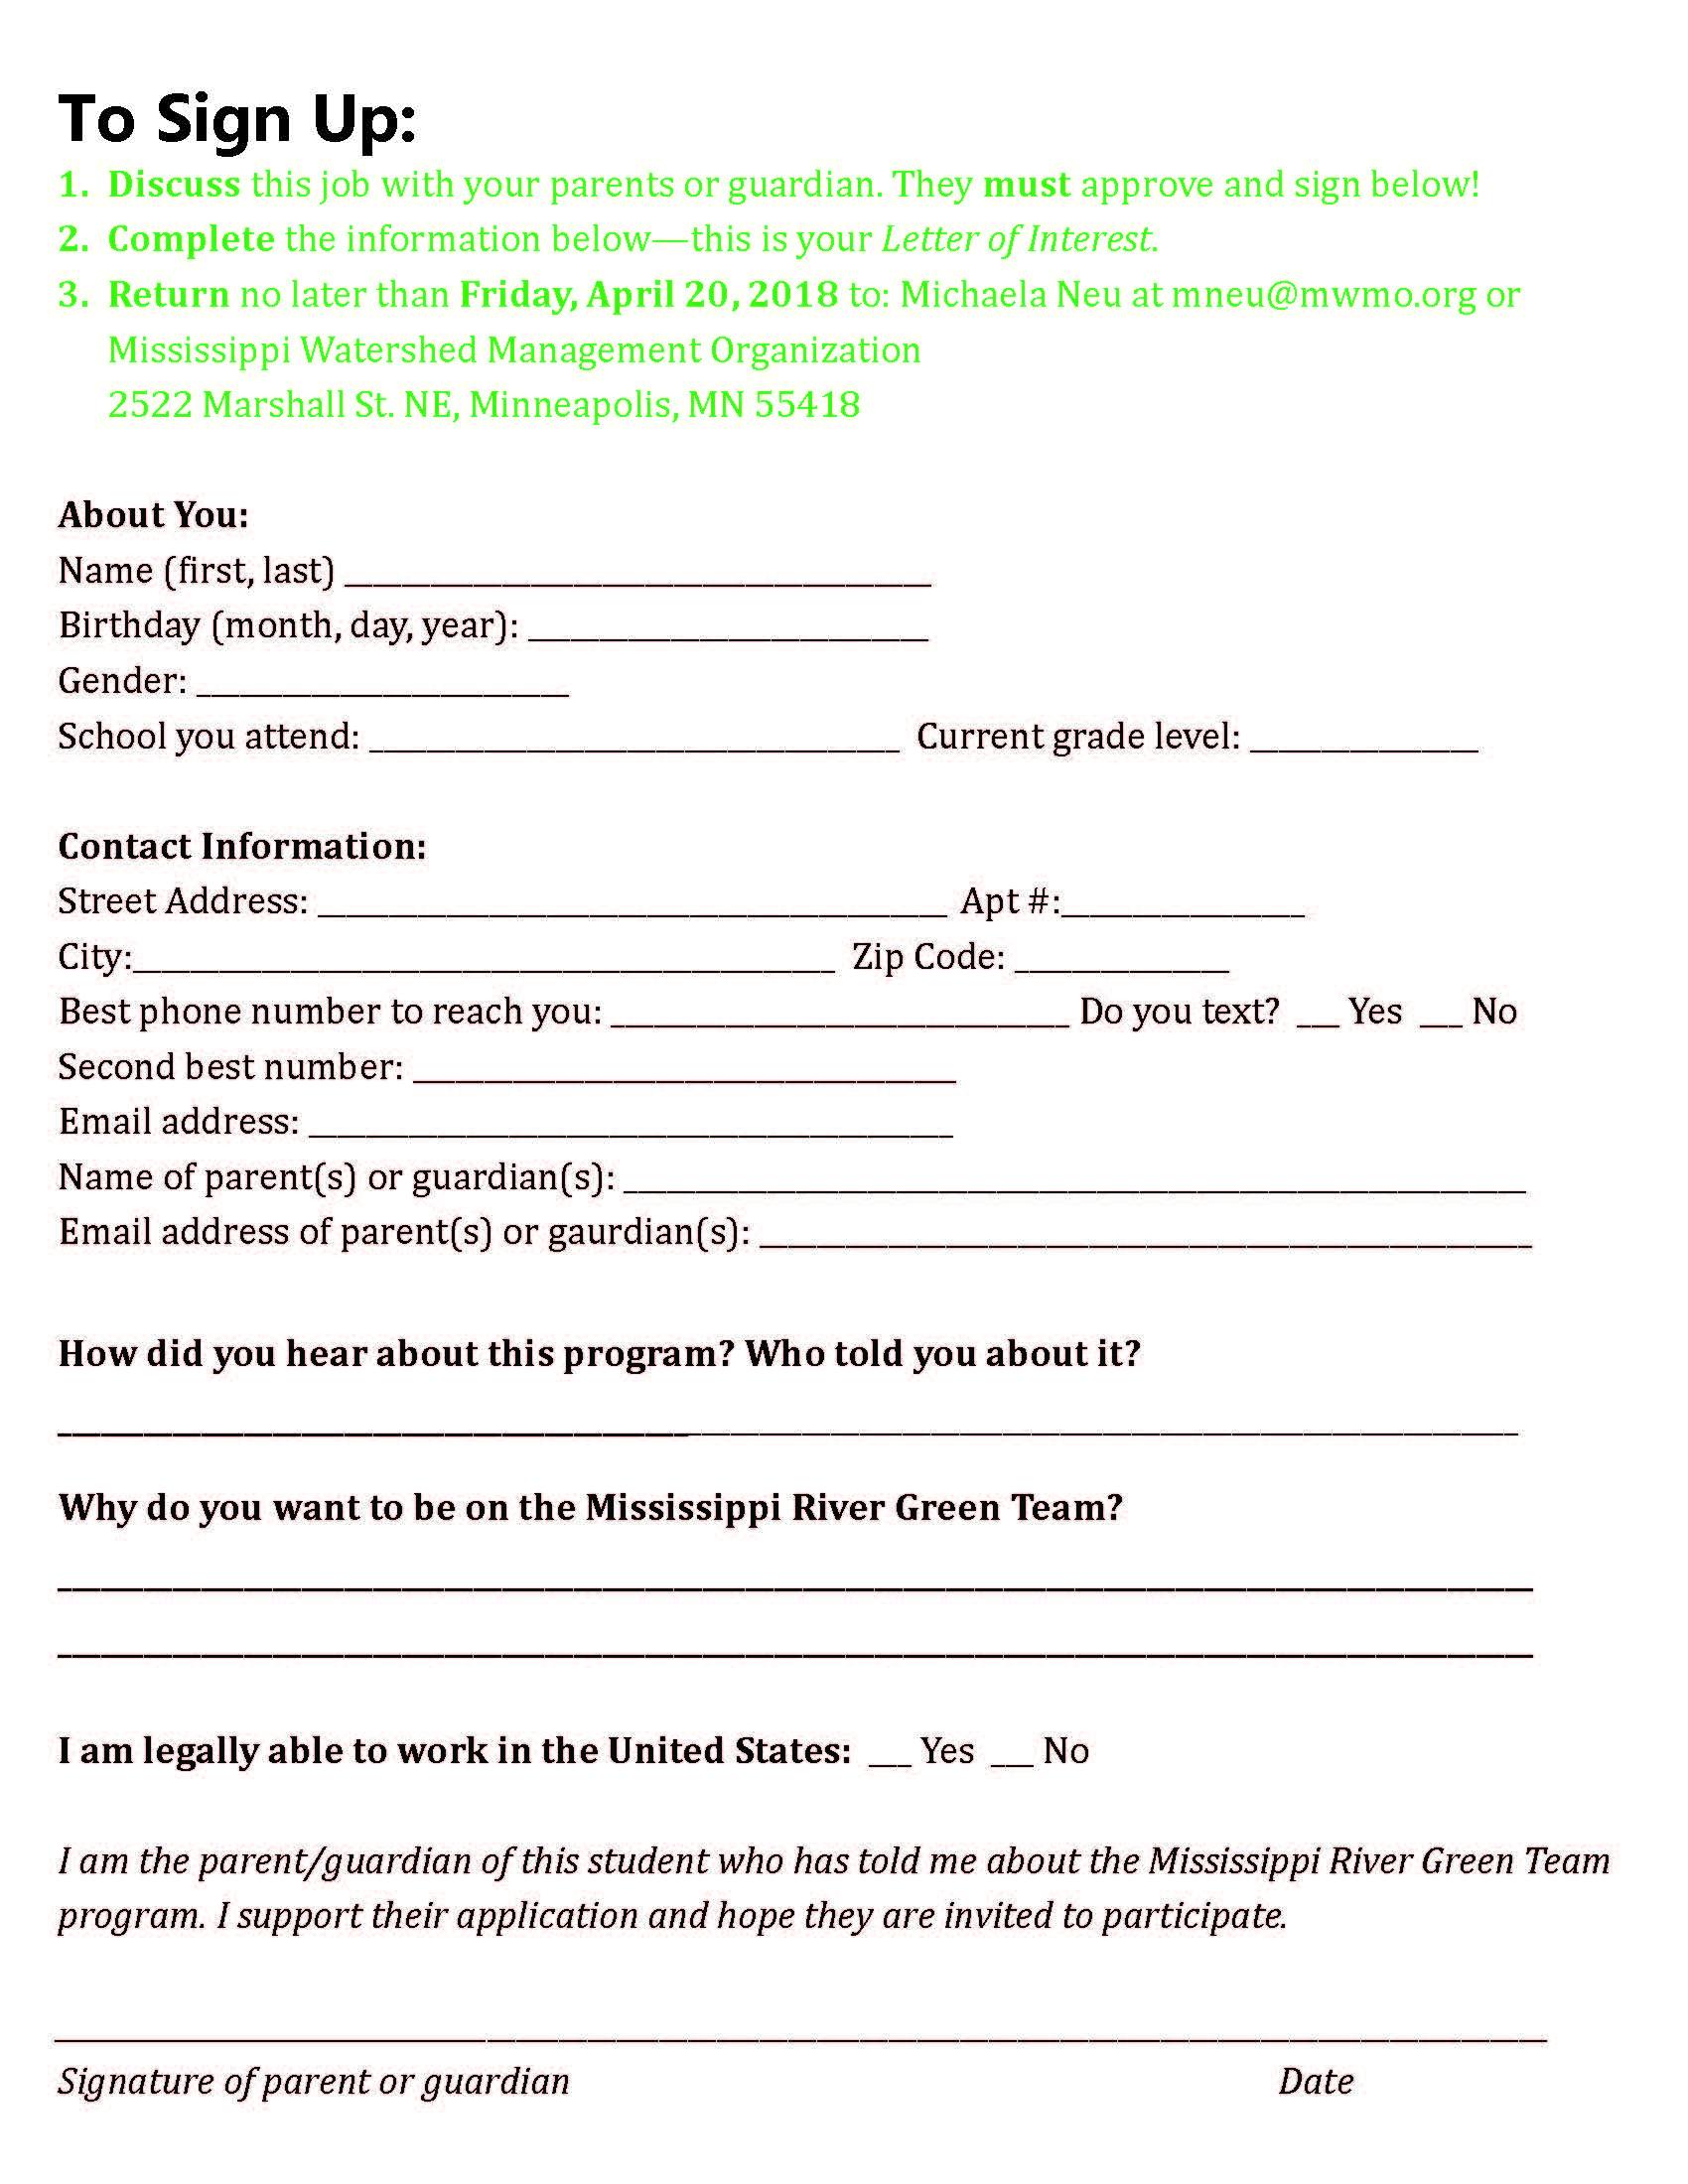 MRGT Letter of Interest 2018 (1)_Page_2.jpg